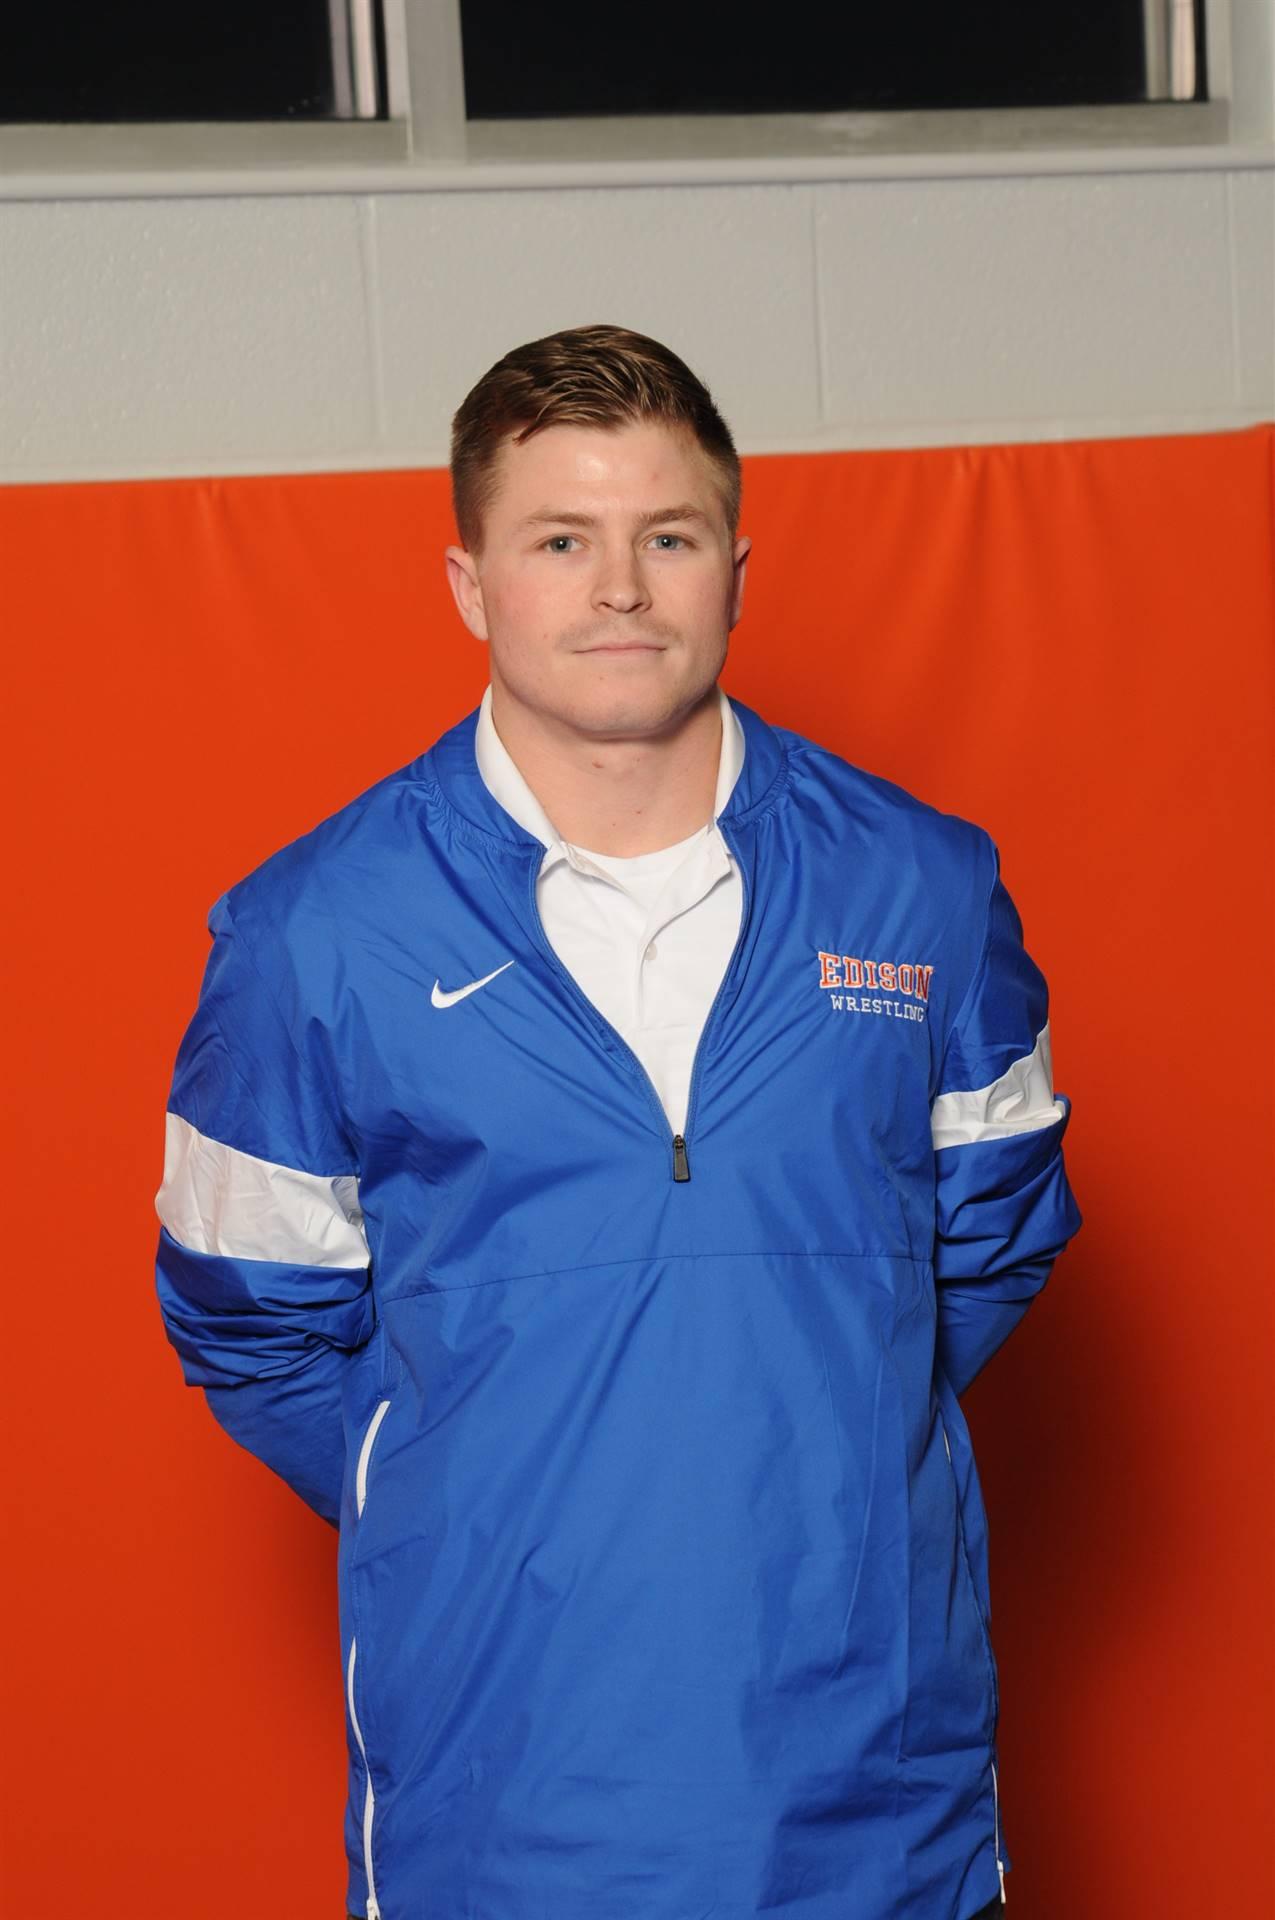 Assistant Coach - Dalton Howard